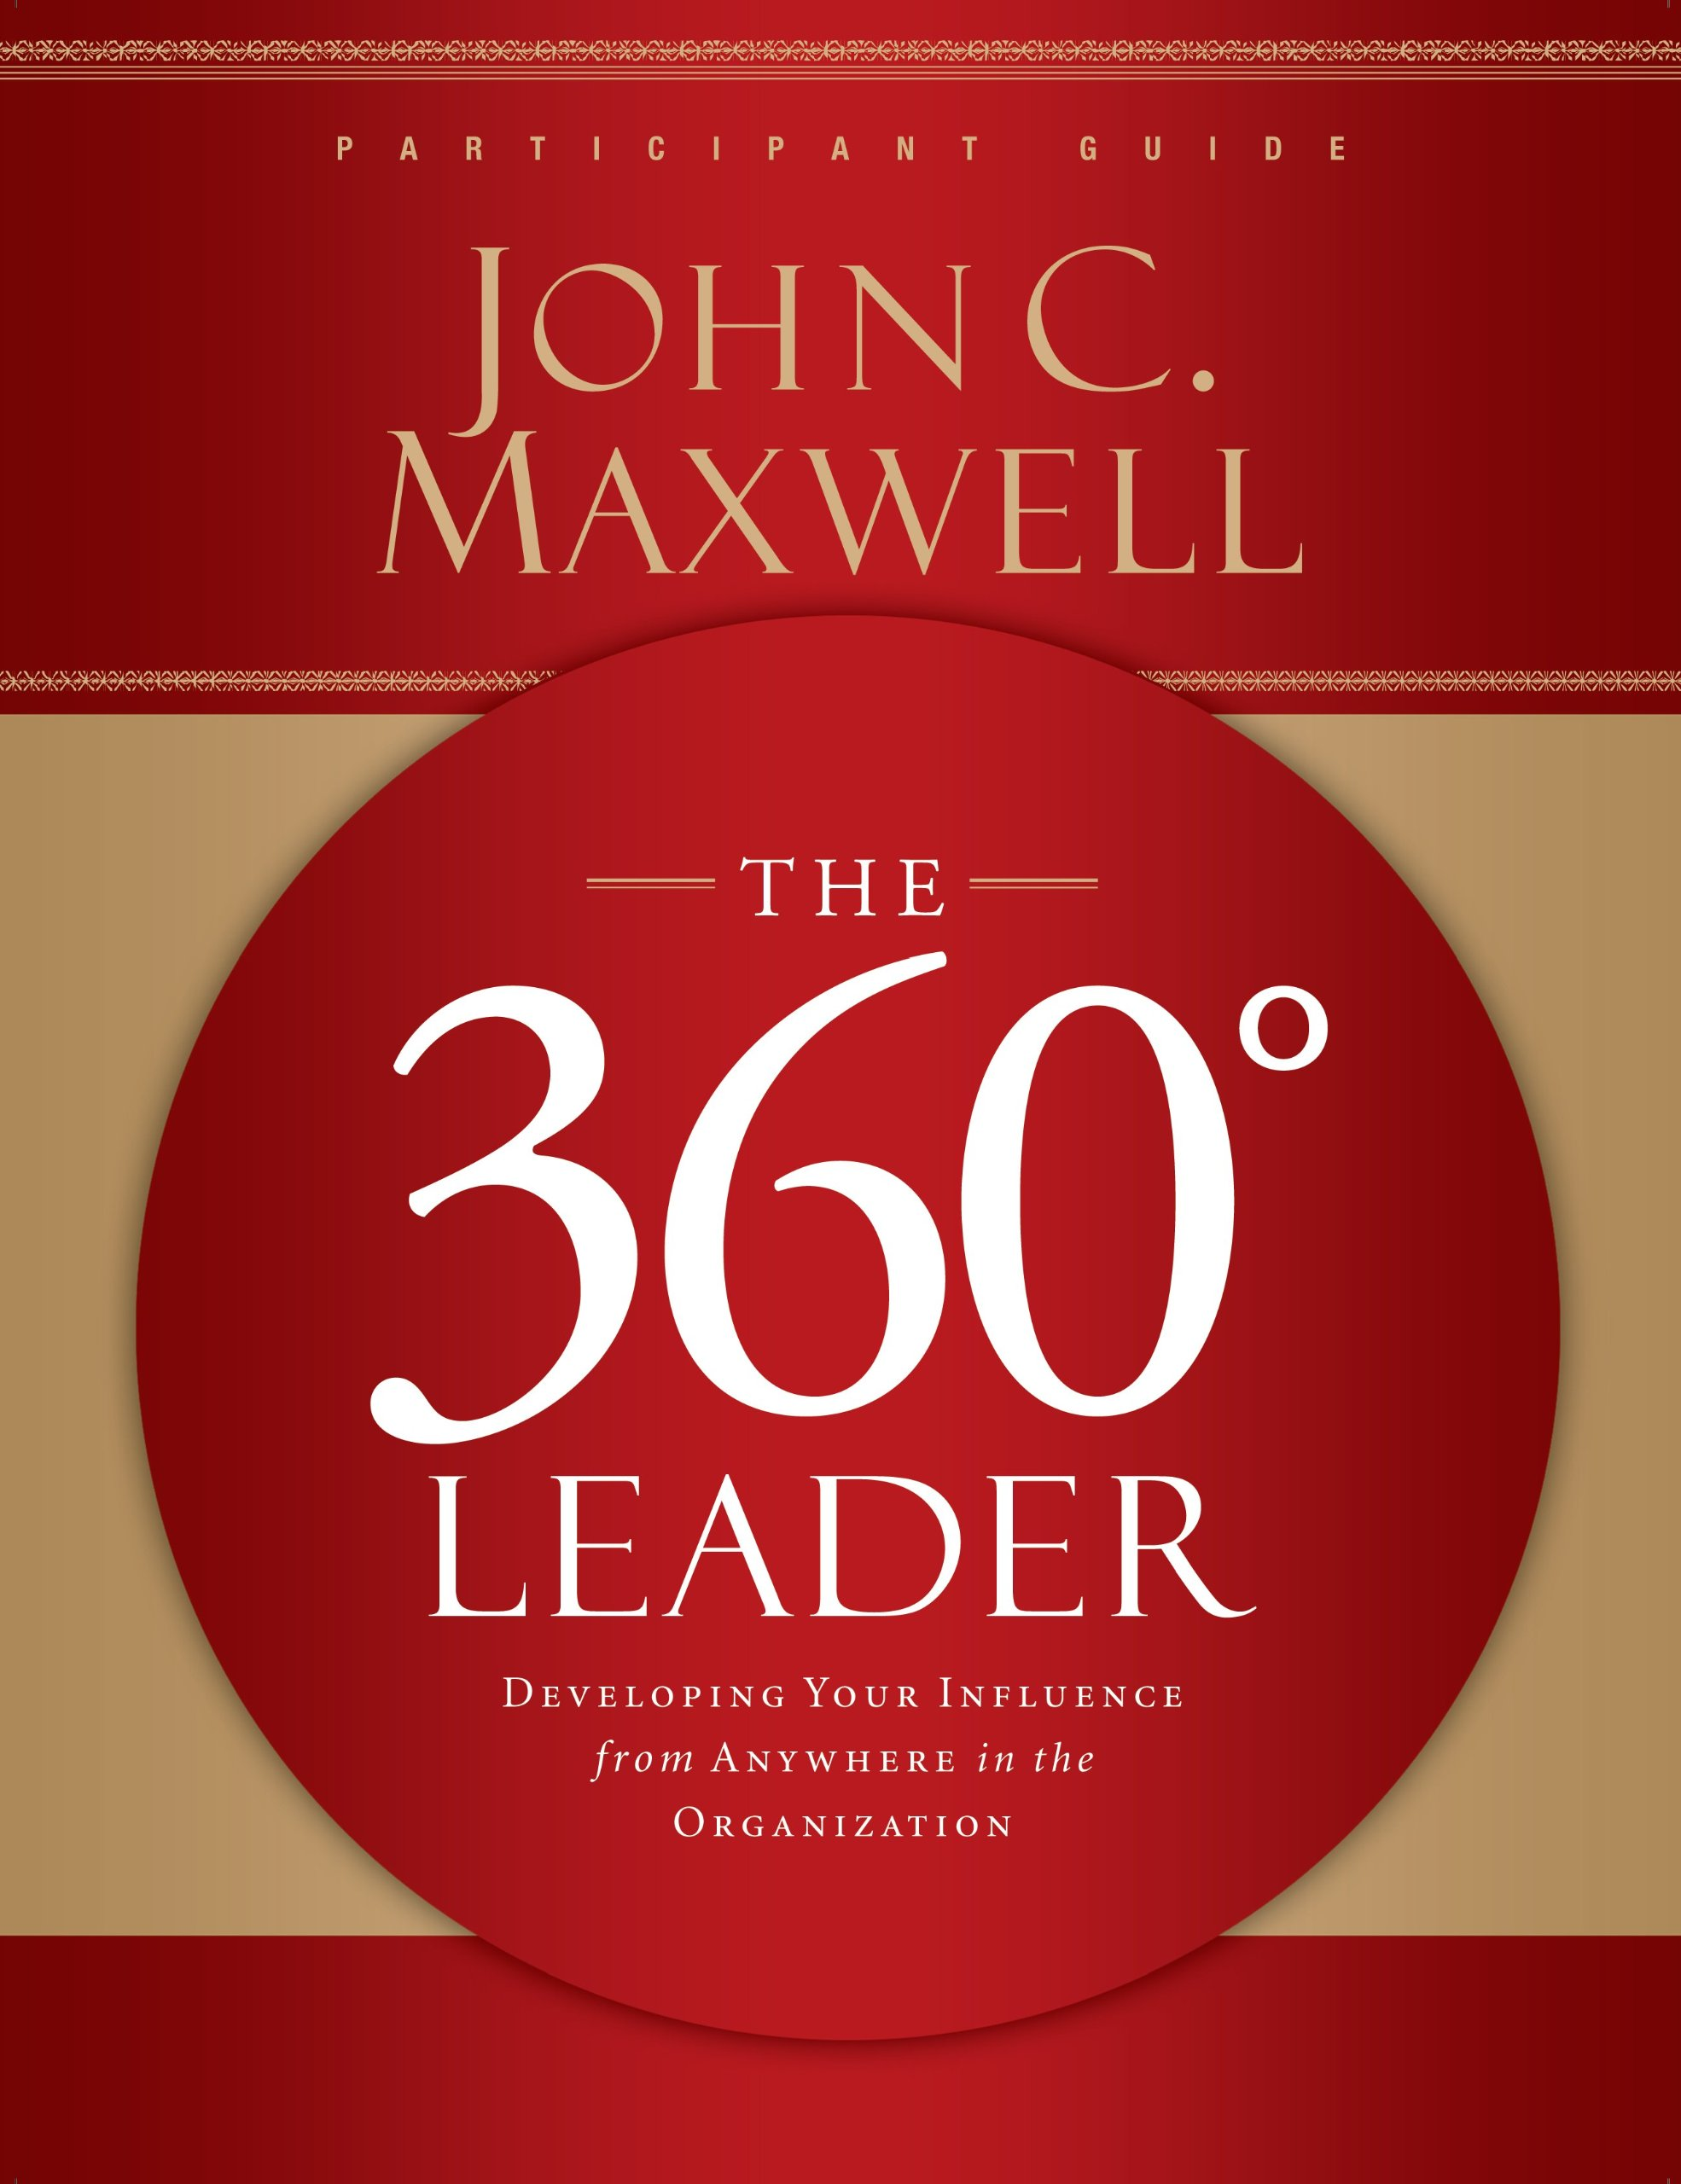 The 360° Leader Summary